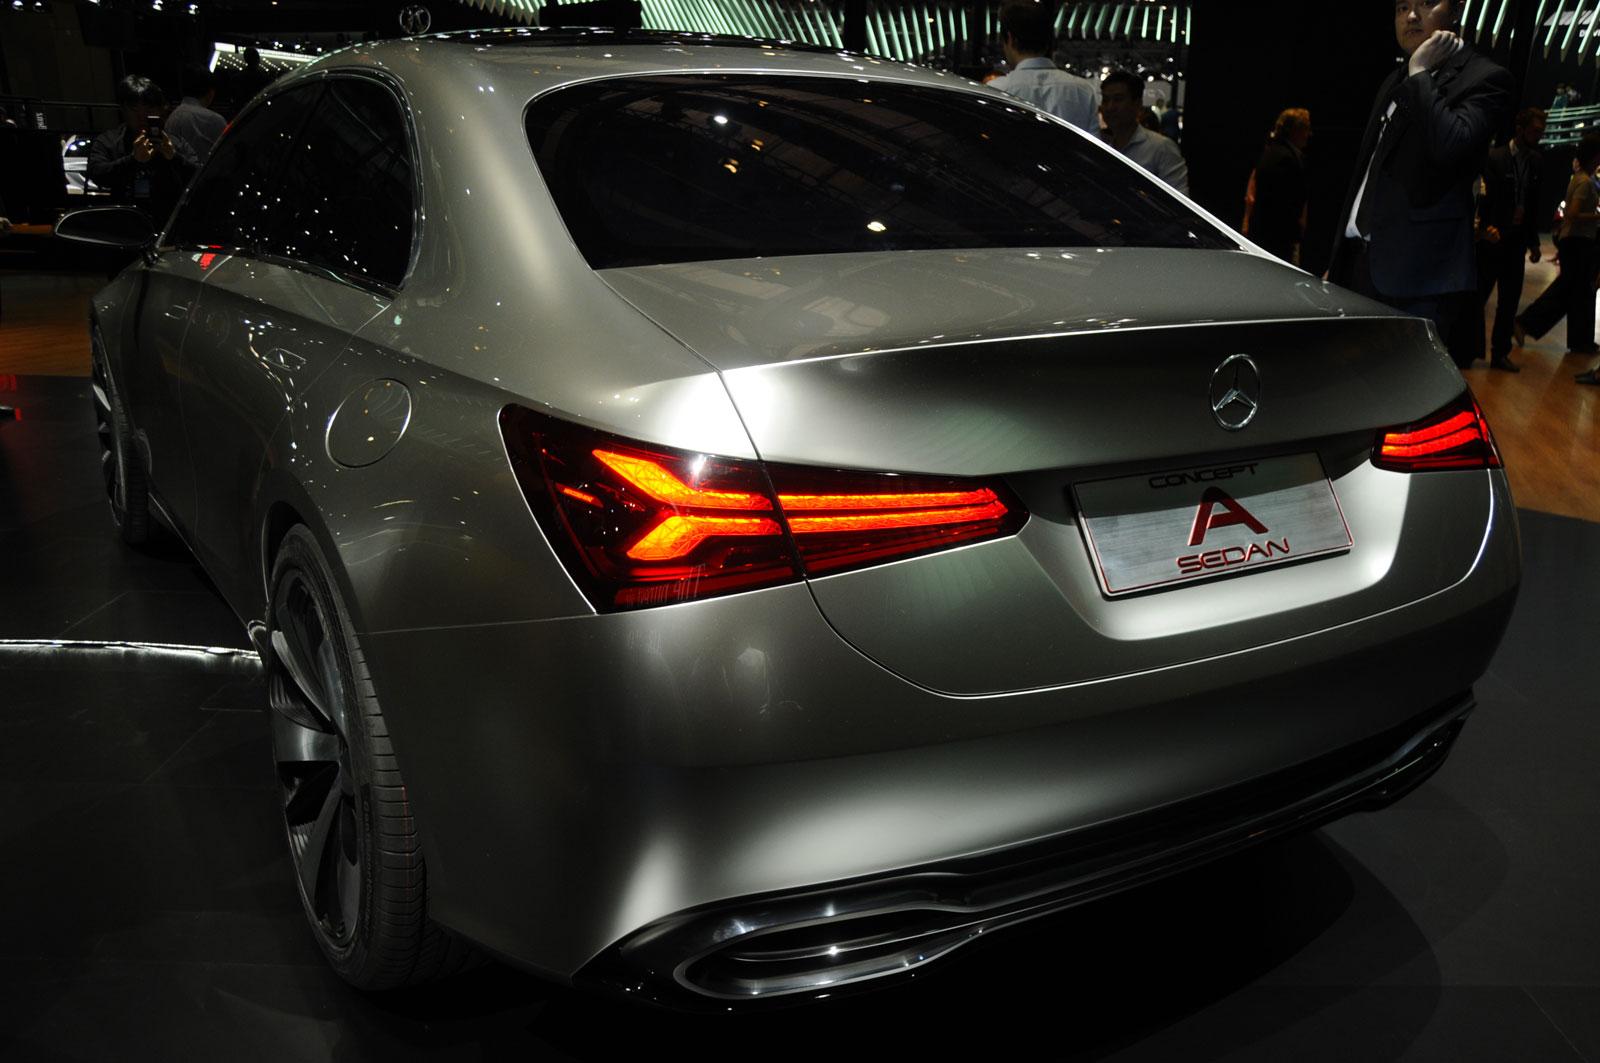 http://www.carbodydesign.com/media/2017/04/Mercedes-Benz-Concept-A-Sedan-at-the-2017-Shanghai-Show-04.jpg